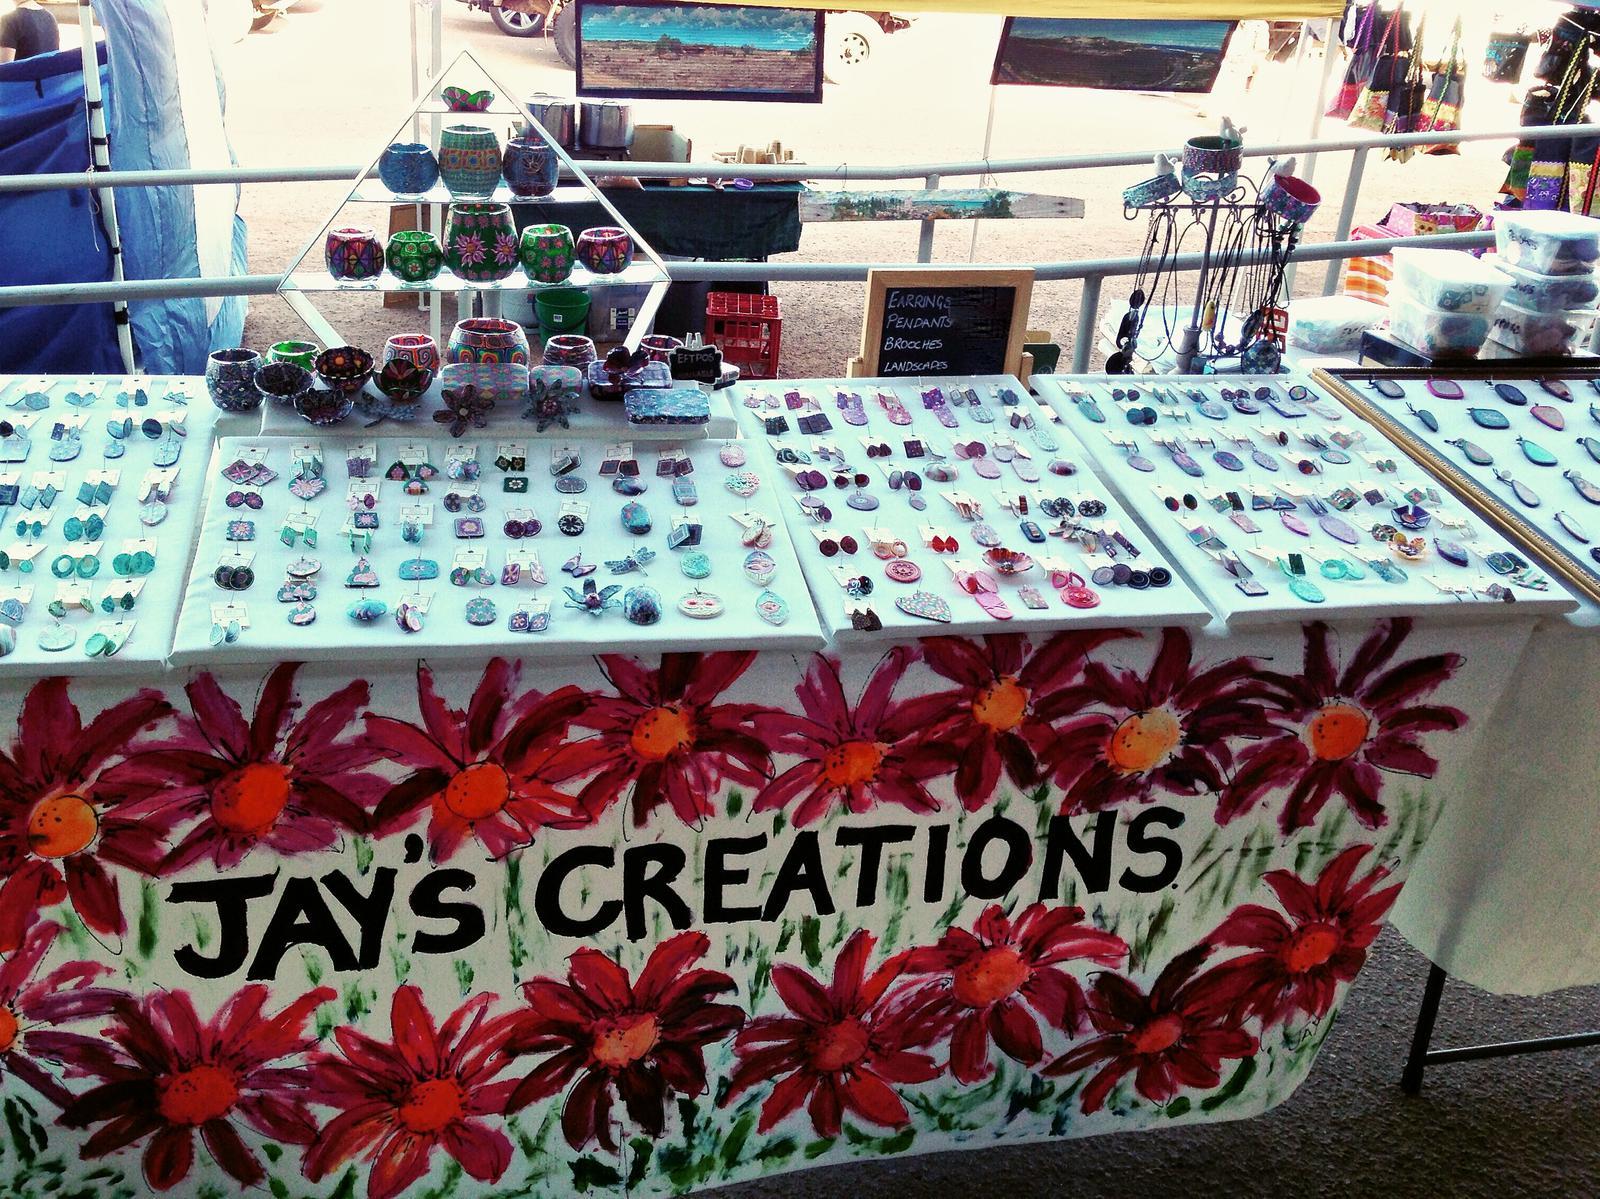 Jay's Creations handmade polymer clay jewellery